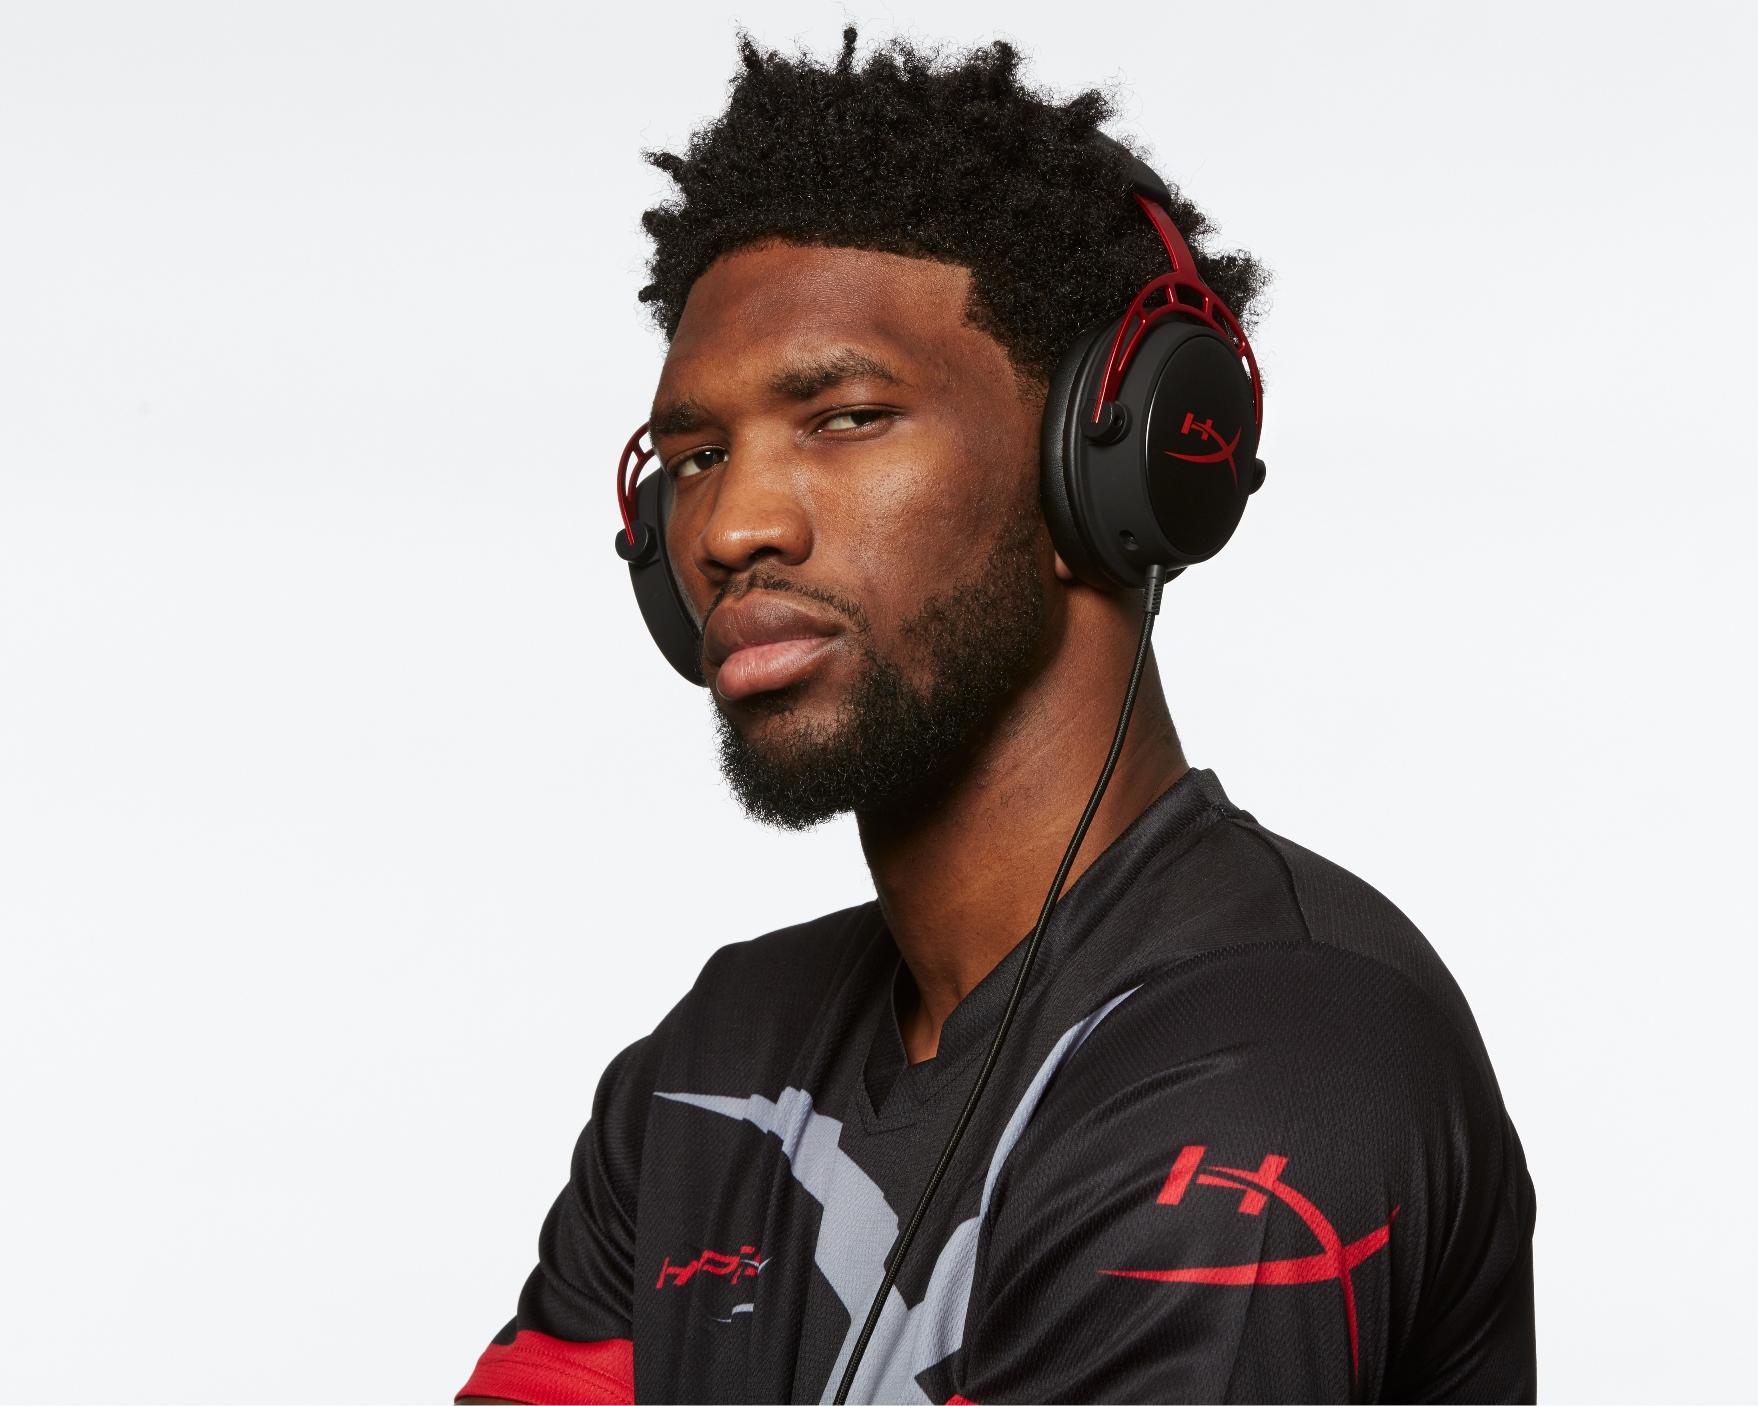 NBA 中鋒 Joel Embiid 都打機? 成為 HyperX 電競耳機品牌大使